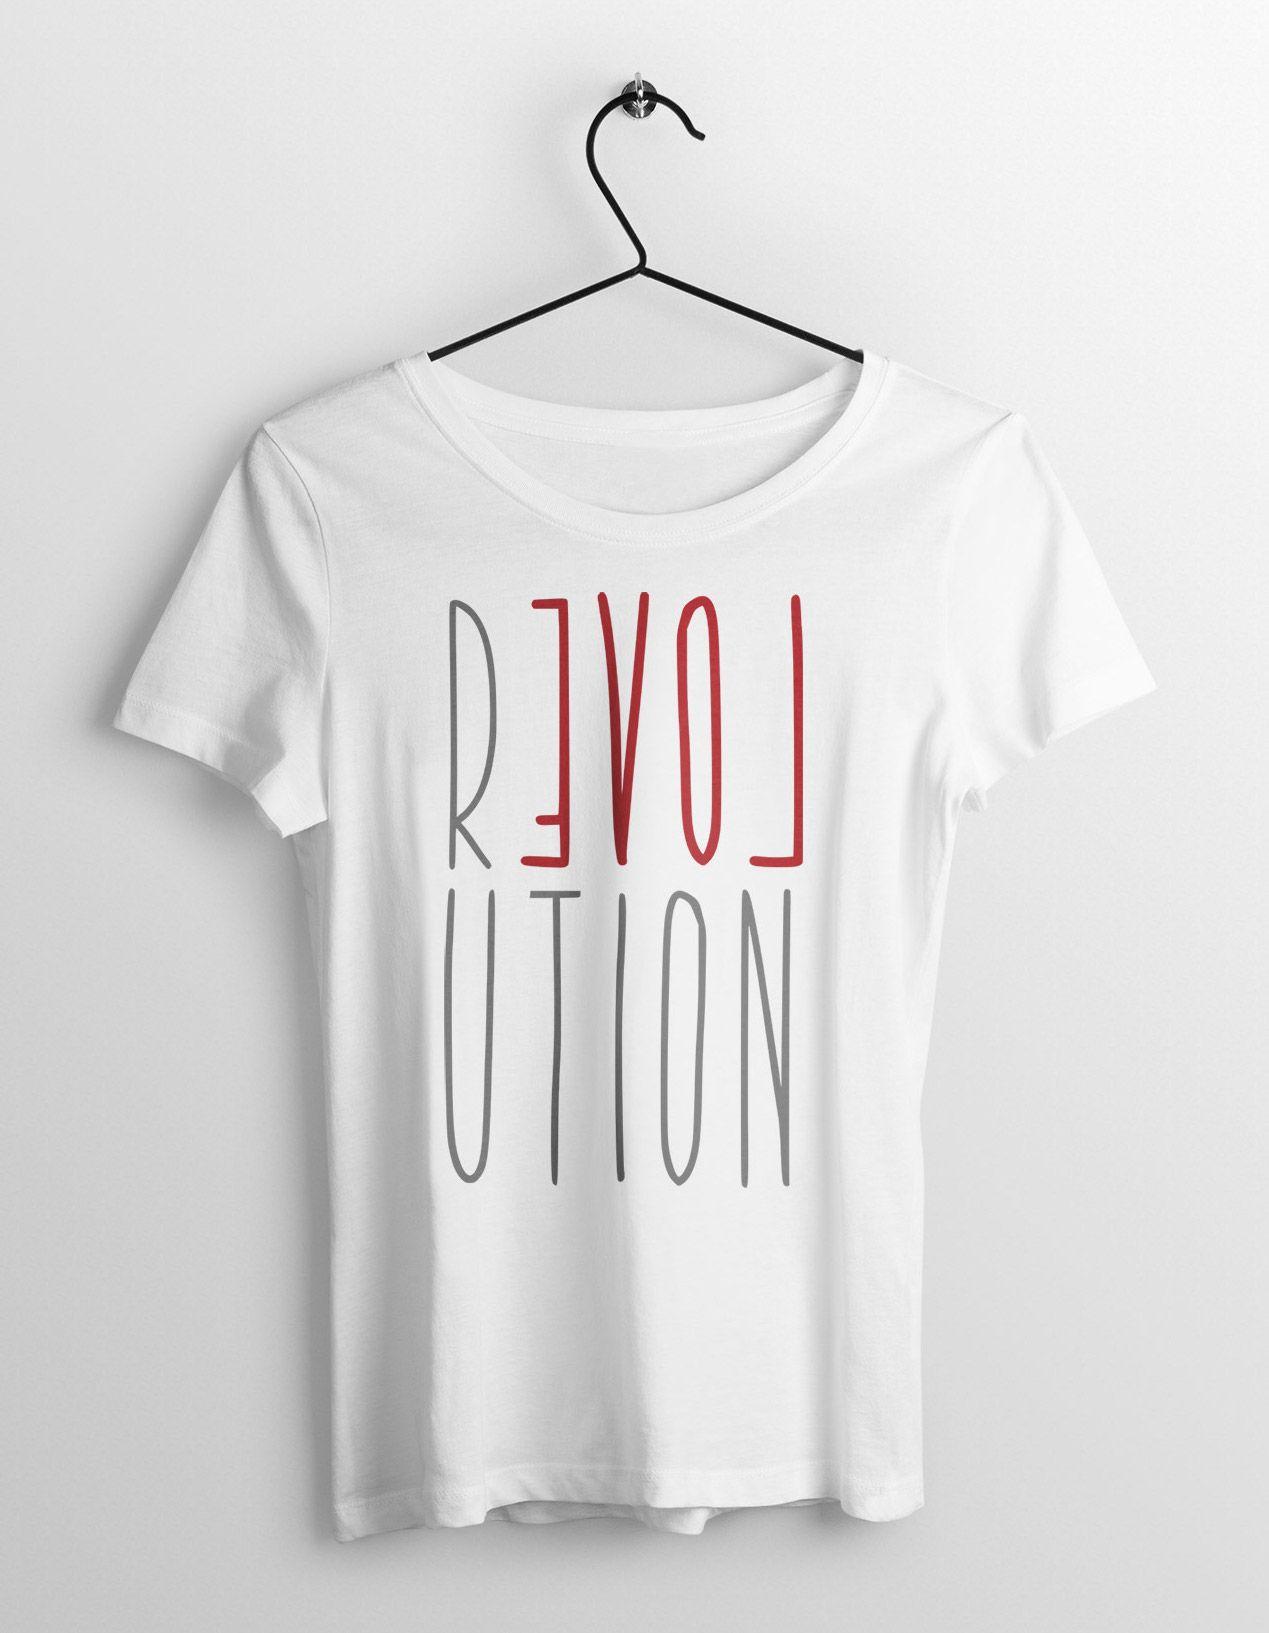 7e2b91a9dd8e8c #Revolution #Love #Peace #Printshirt #Loveprint #Peaceshirt  #Revolutionshirt #Shirt